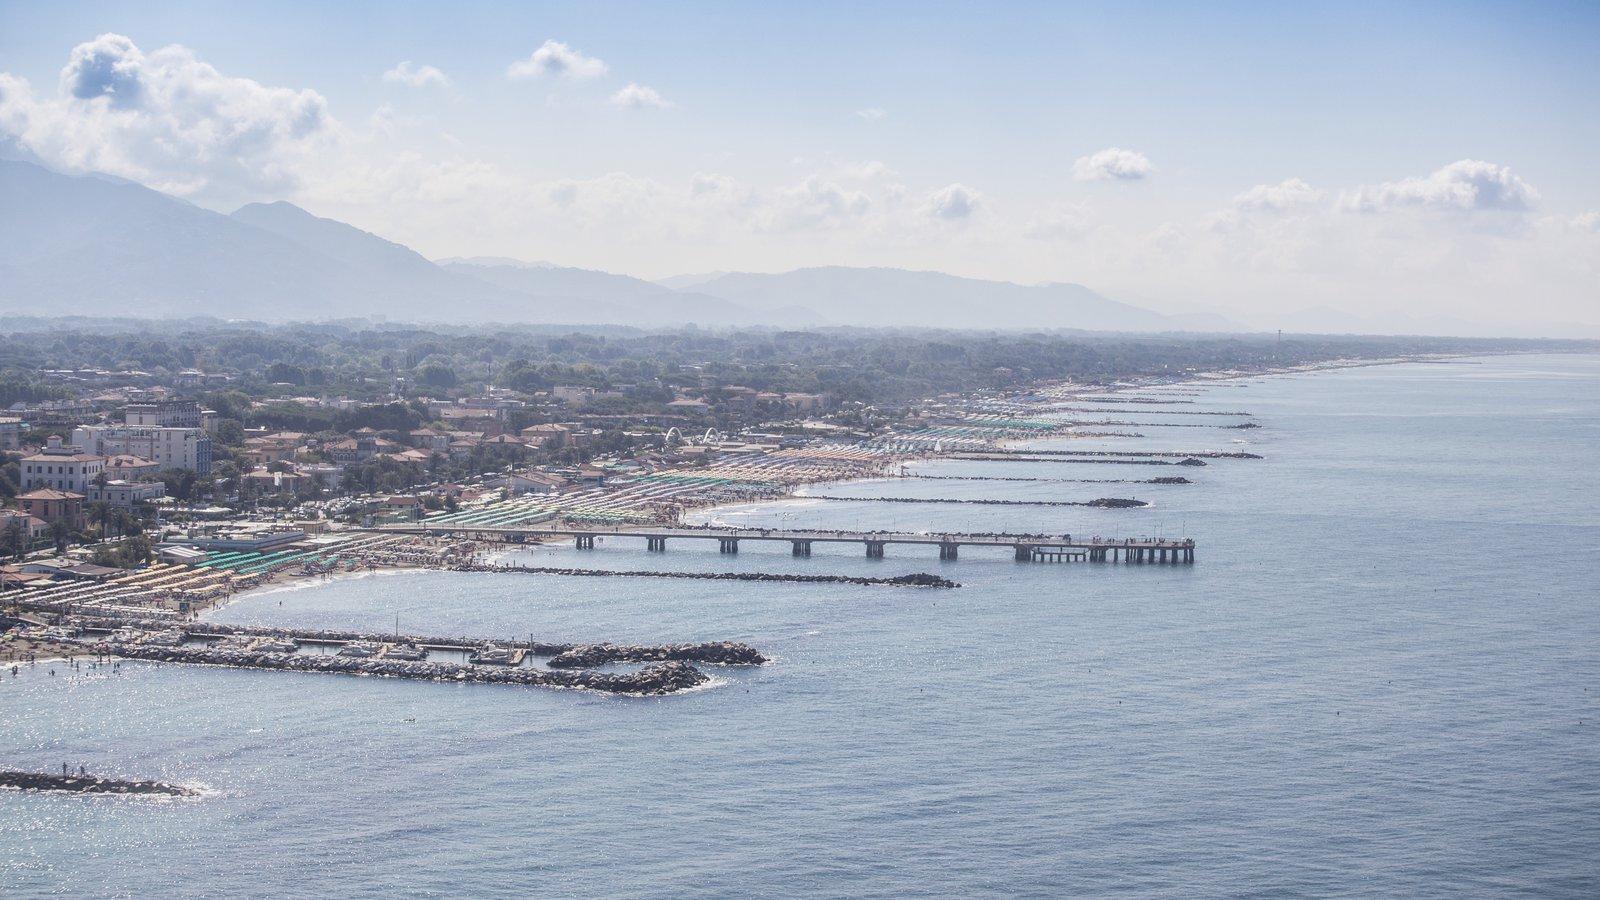 Versilia featuring a coastal town and general coastal views